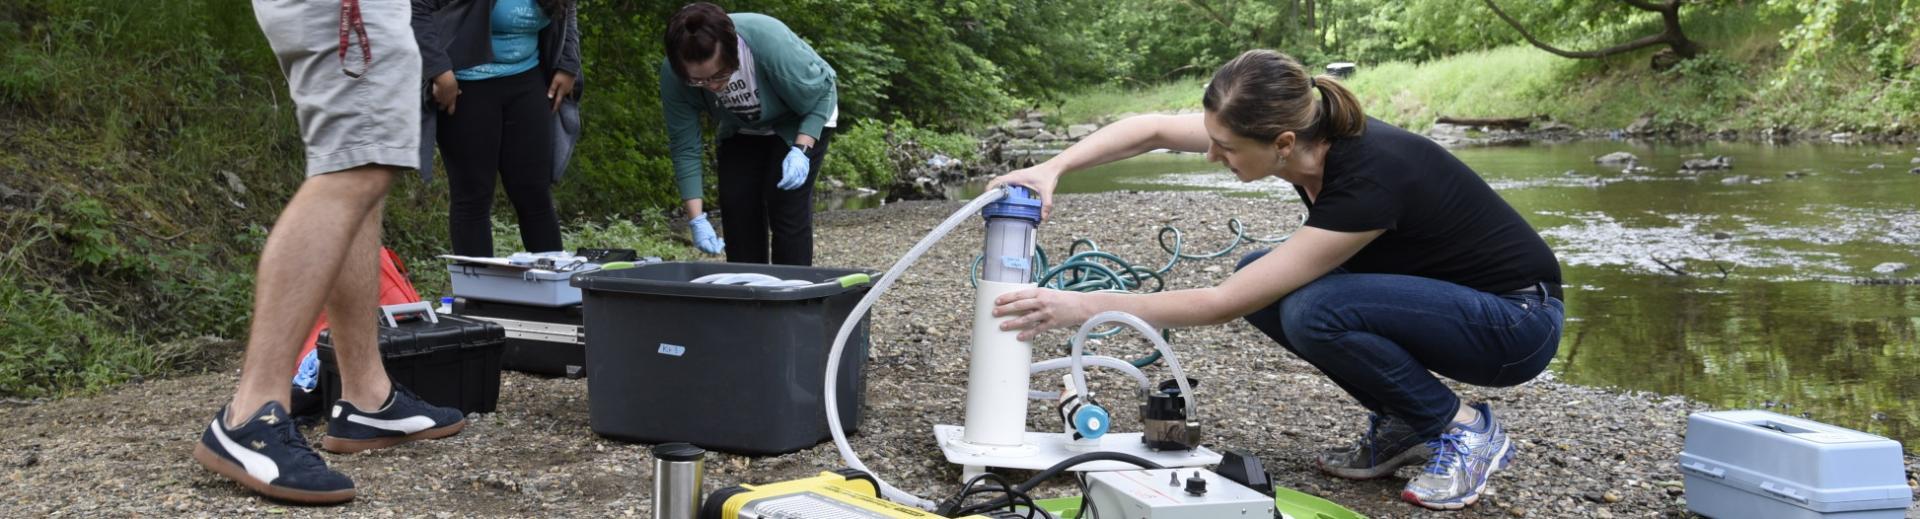 Environmental health class testing river water